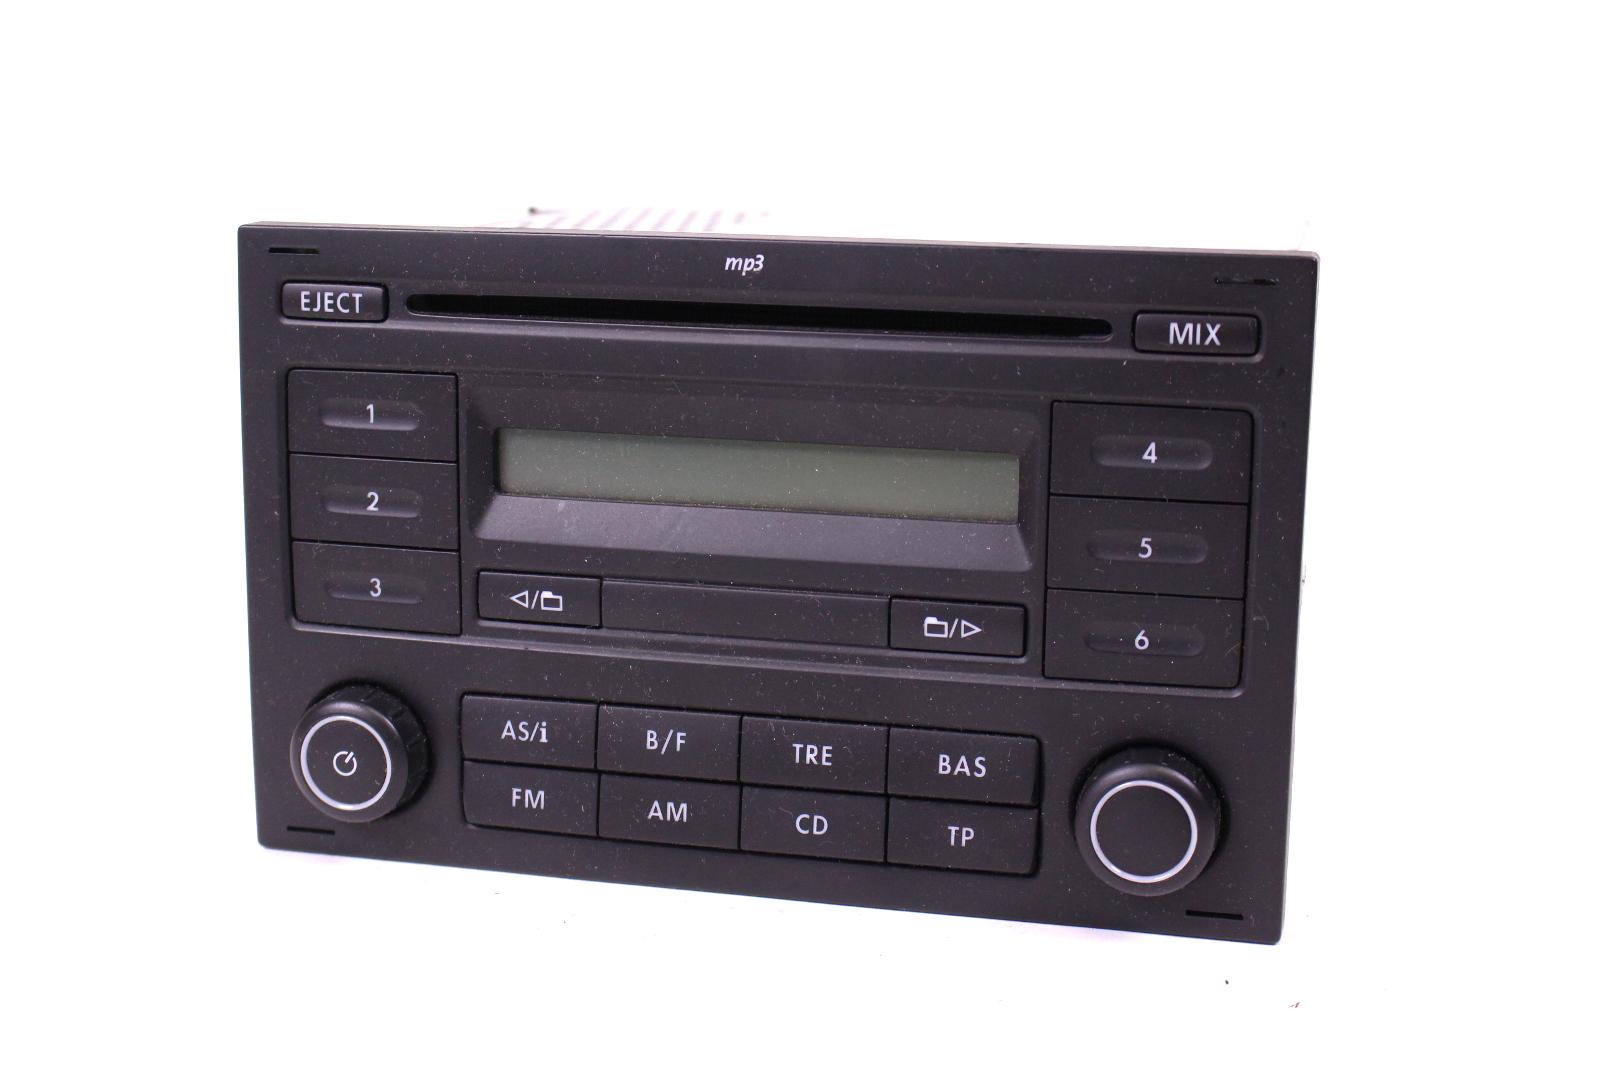 autoradio original vw polo 9n rcd 200 cd radio mit mp3. Black Bedroom Furniture Sets. Home Design Ideas